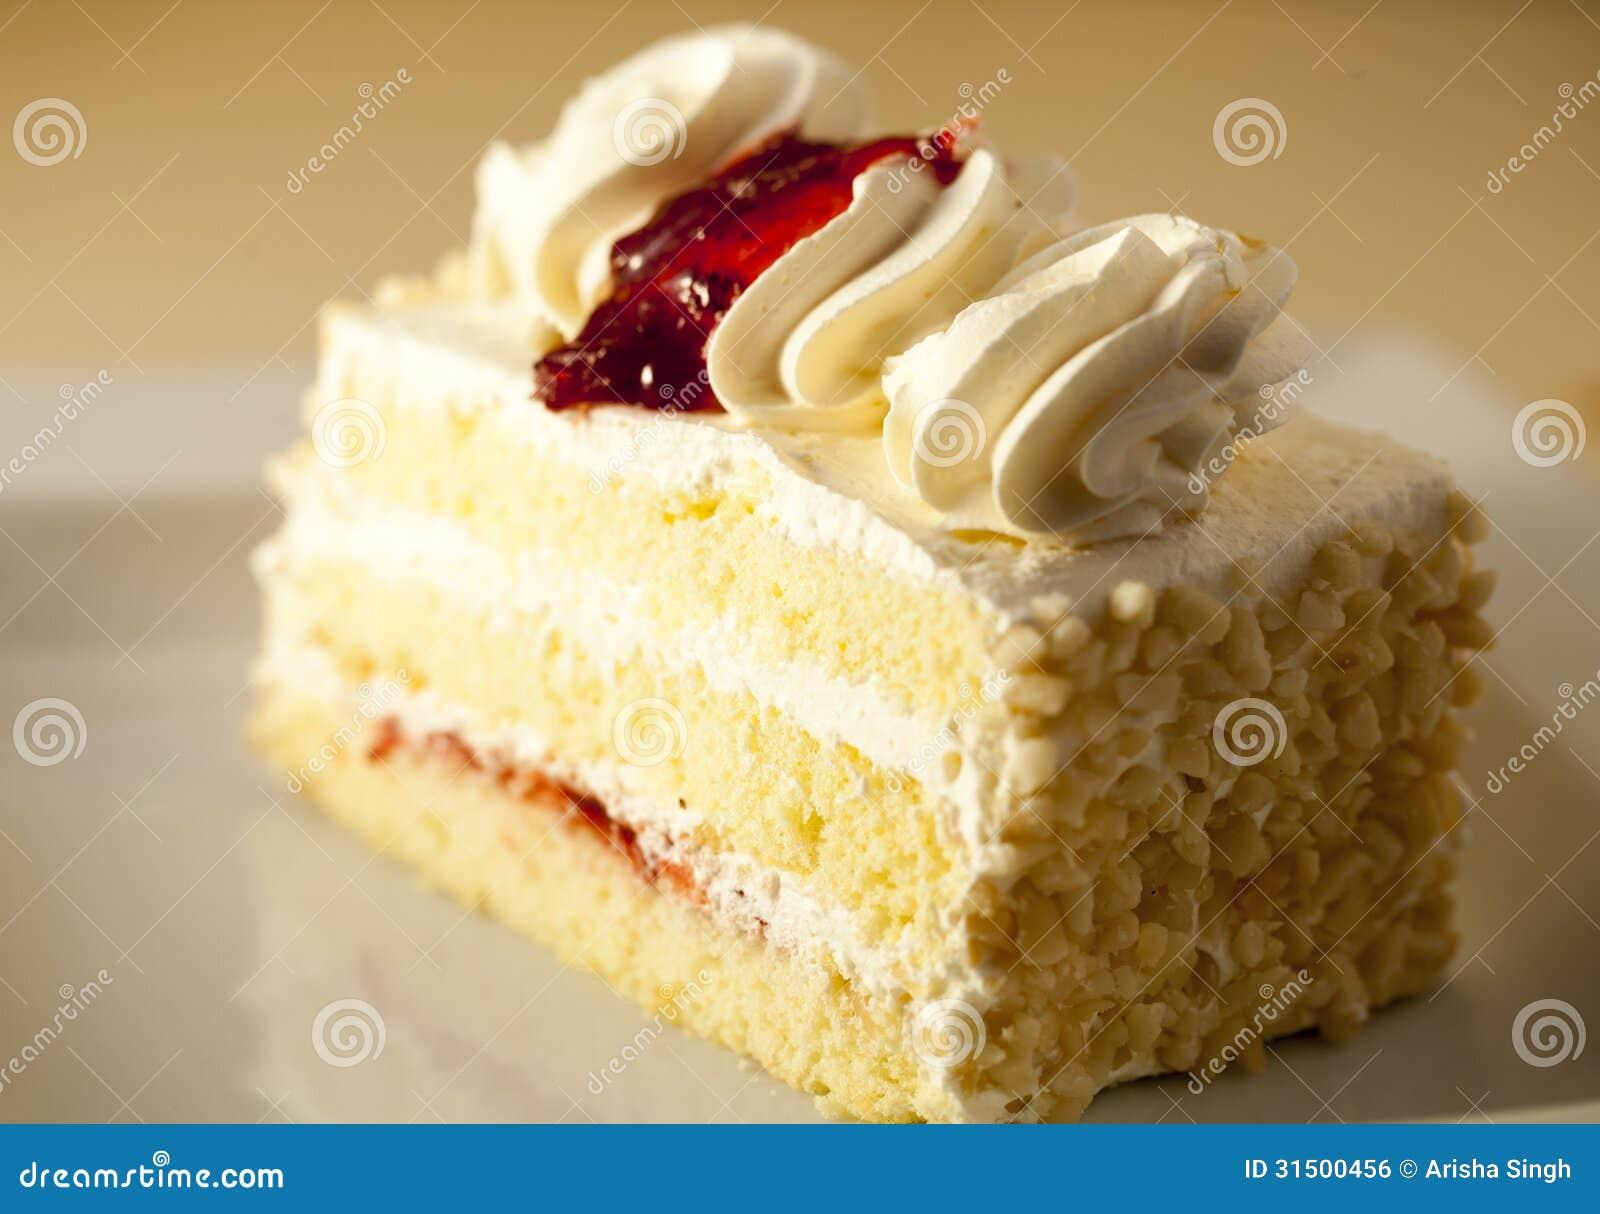 Delicious Homemade Vanilla Cake